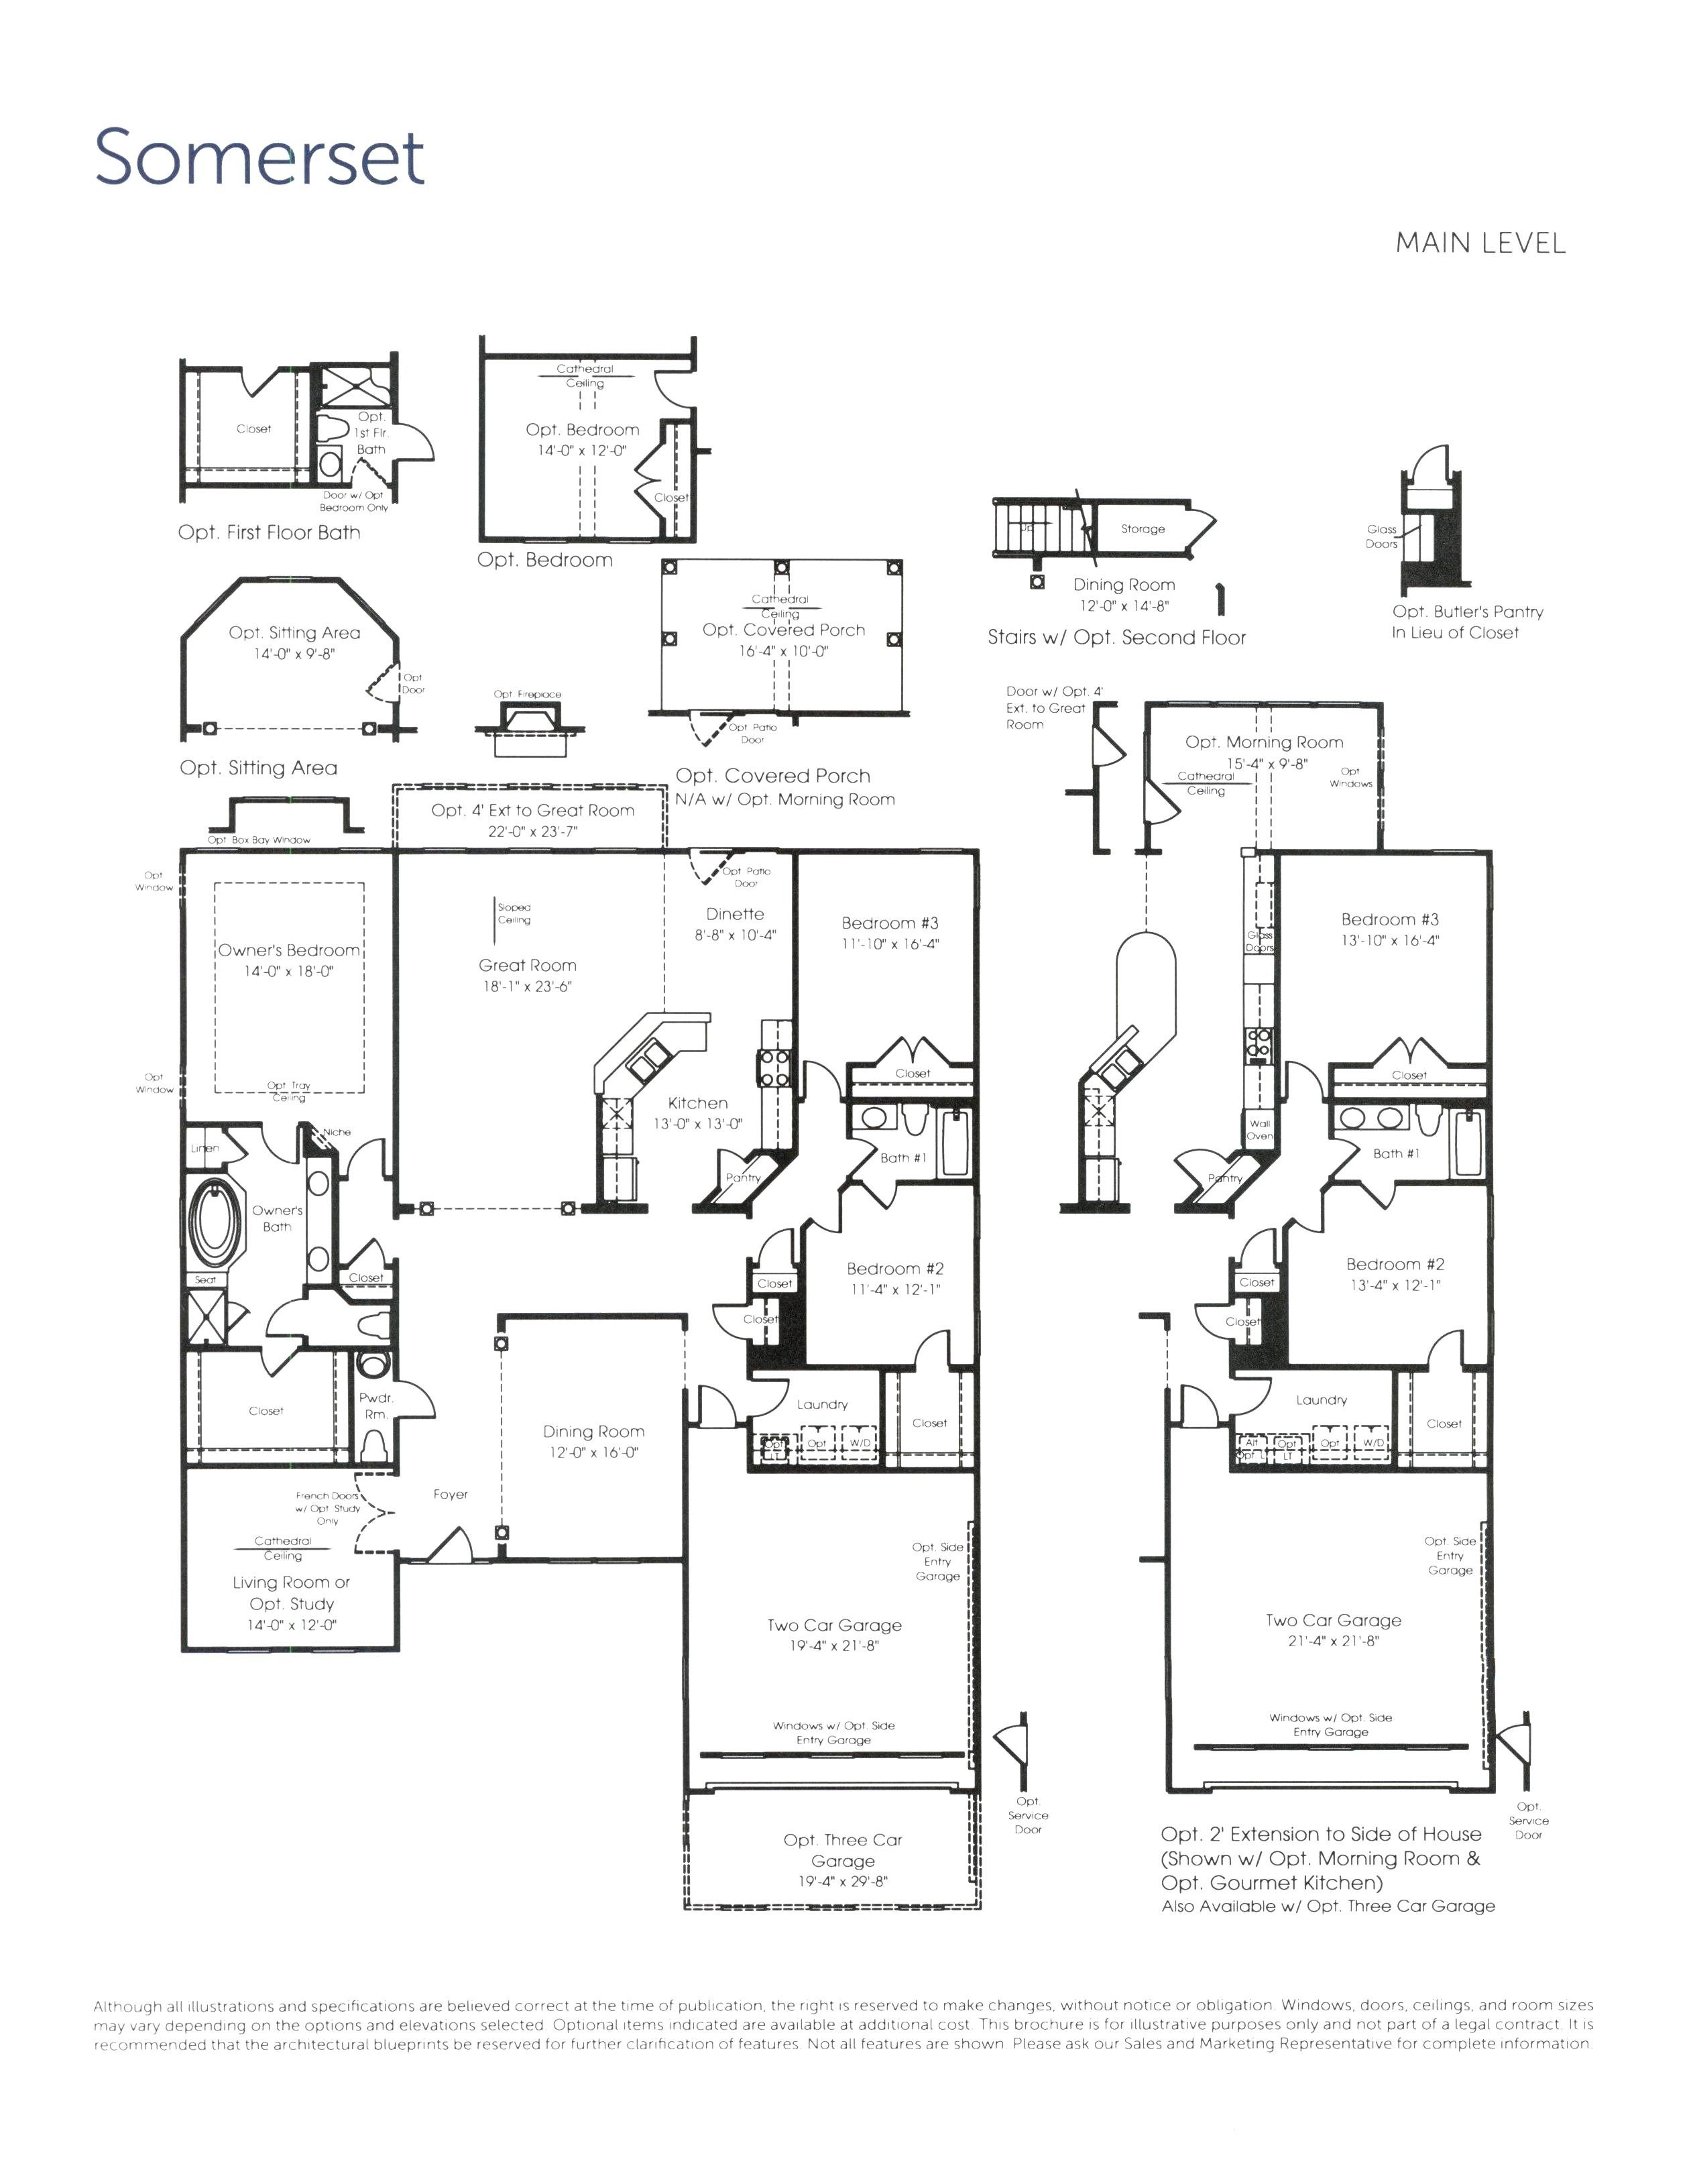 ryan homes bainbridge model unique ryan homes genevieve floor plan new rome floor plan ryan homes